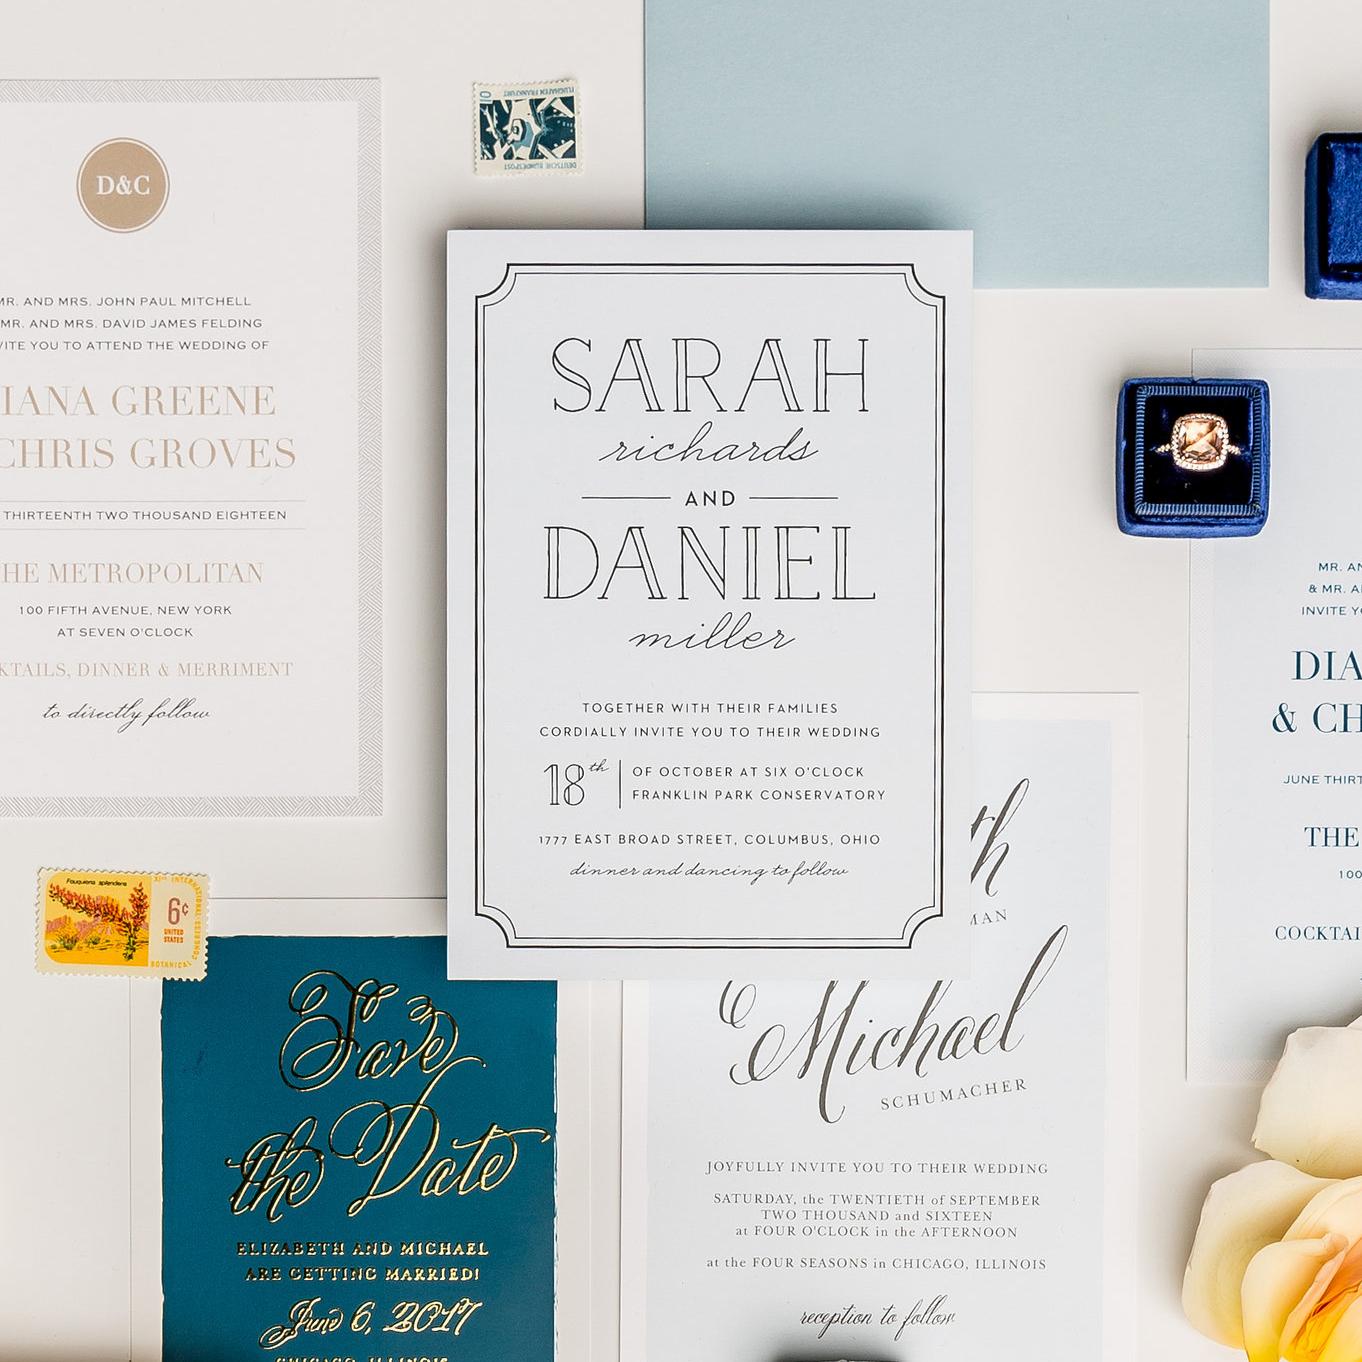 Basic_Invite_Wedding_Suites_45.jpg